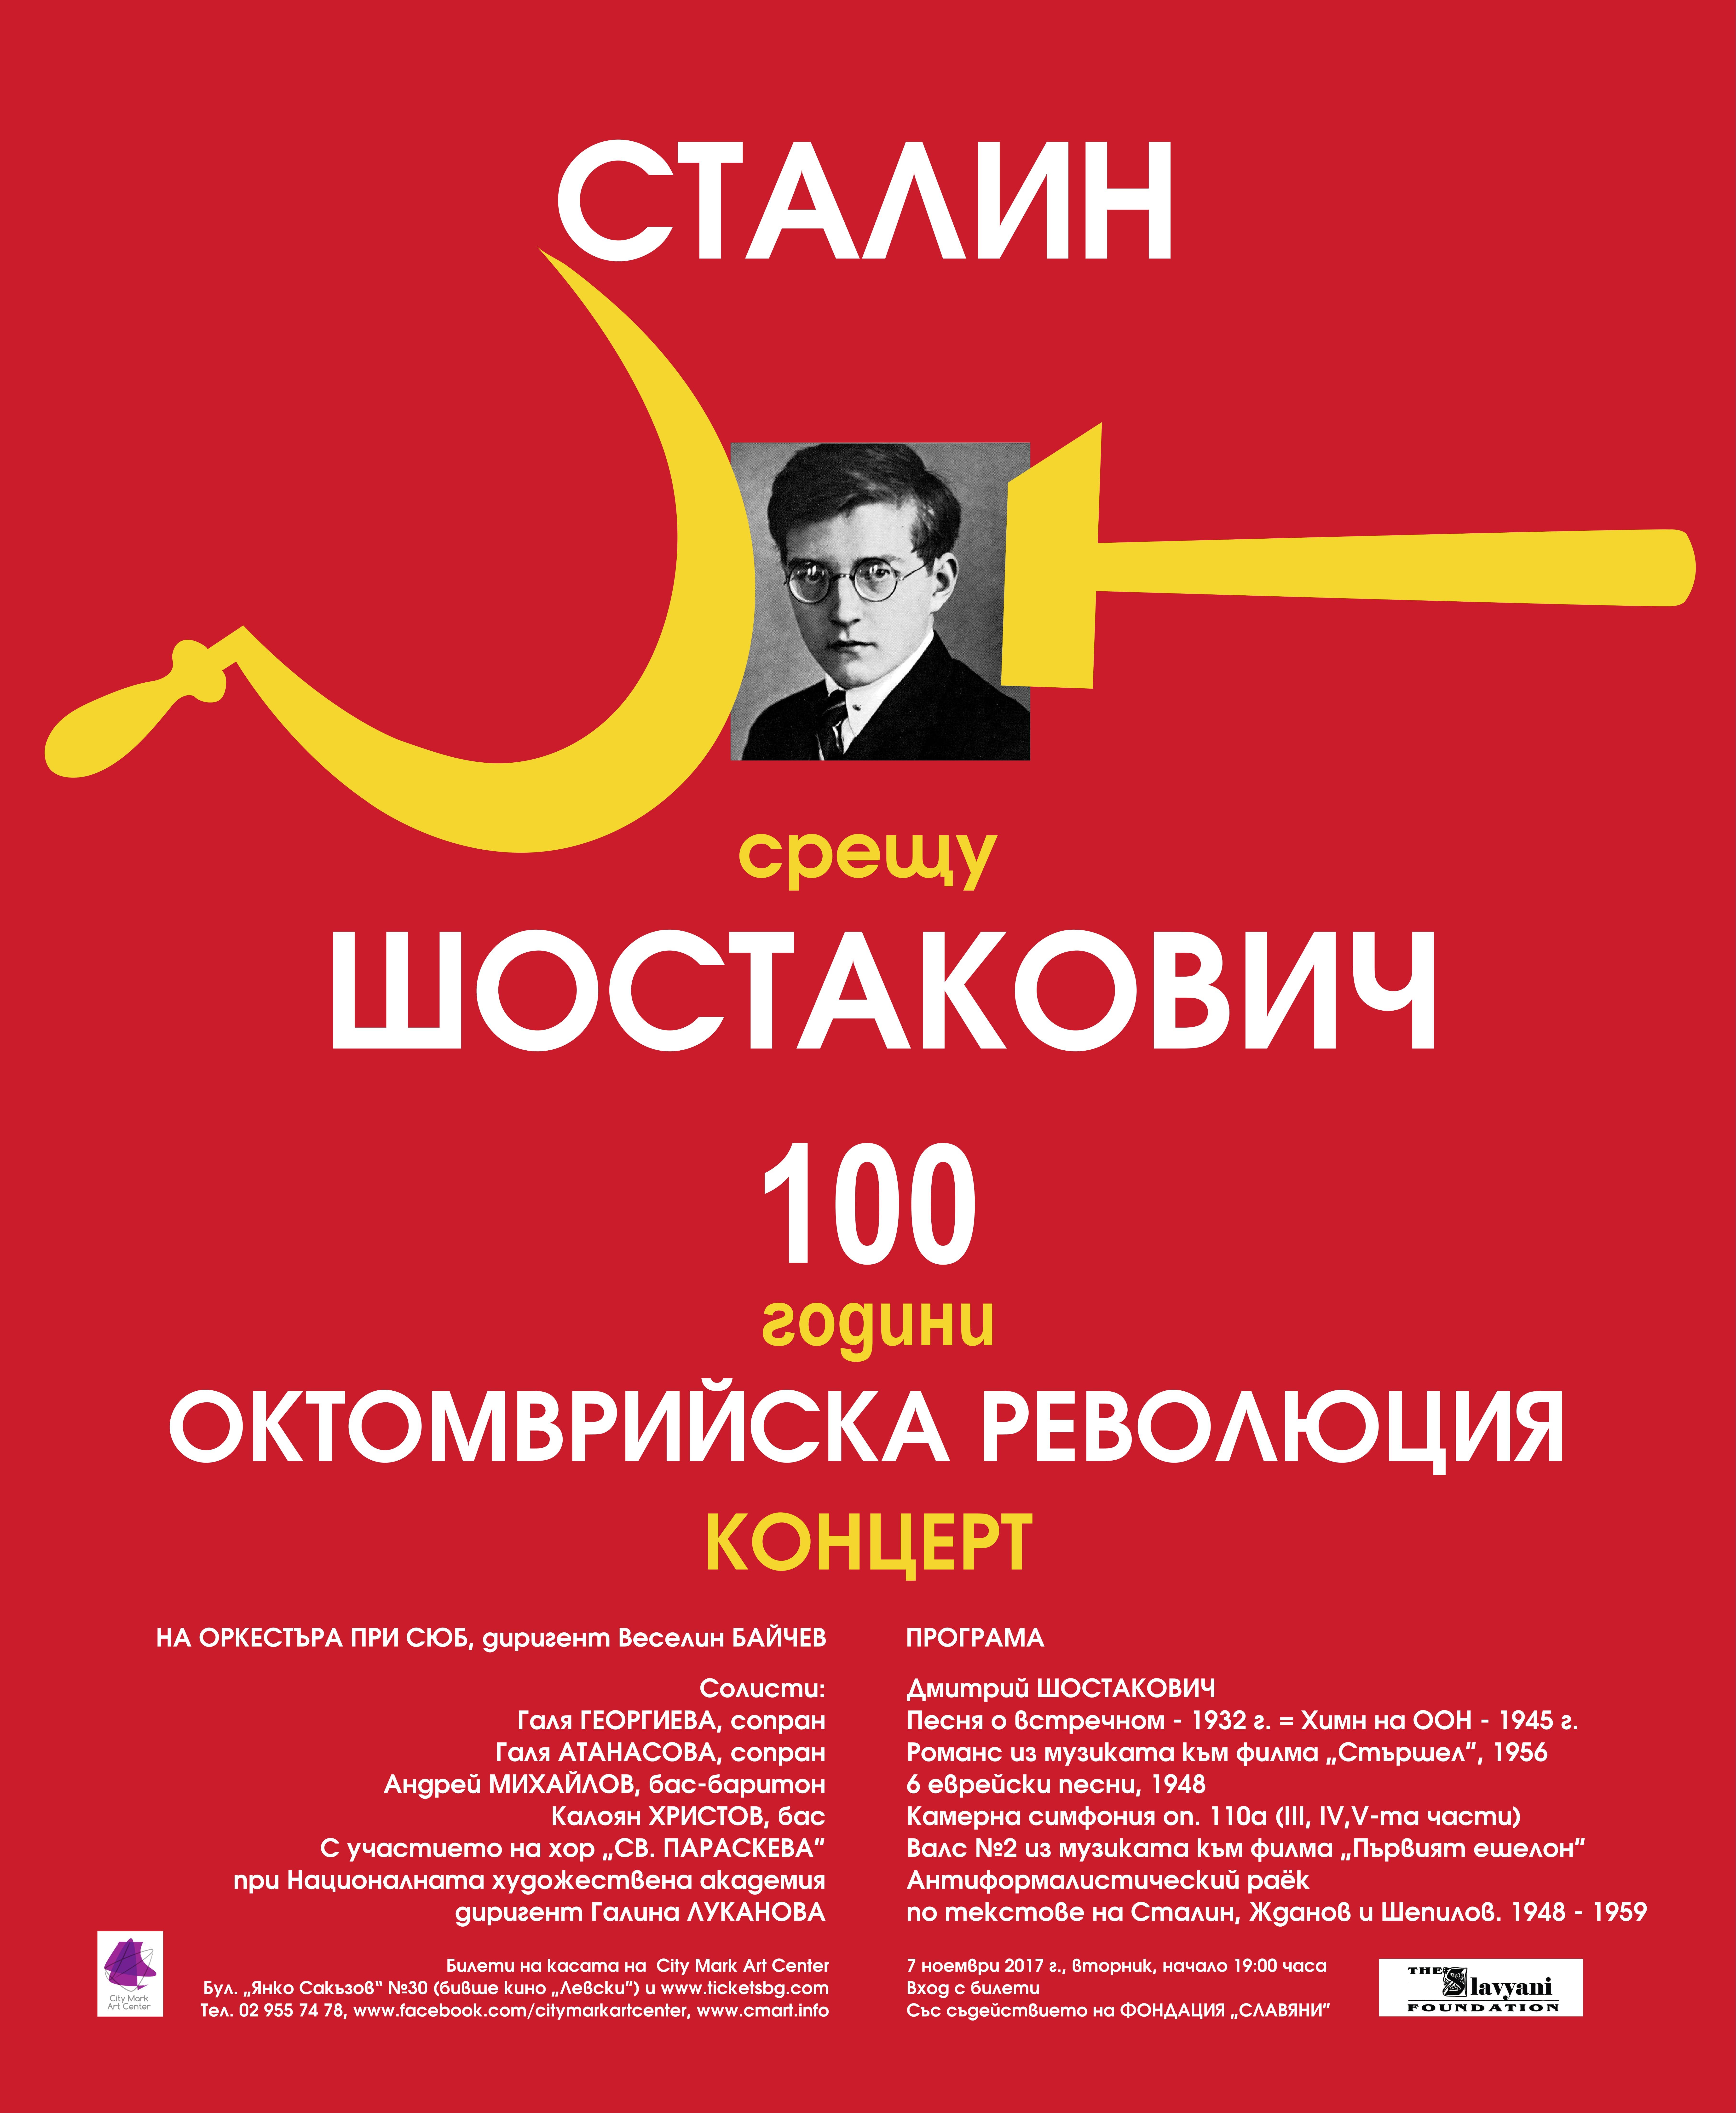 Сталин-Шостакович 2 нов-1